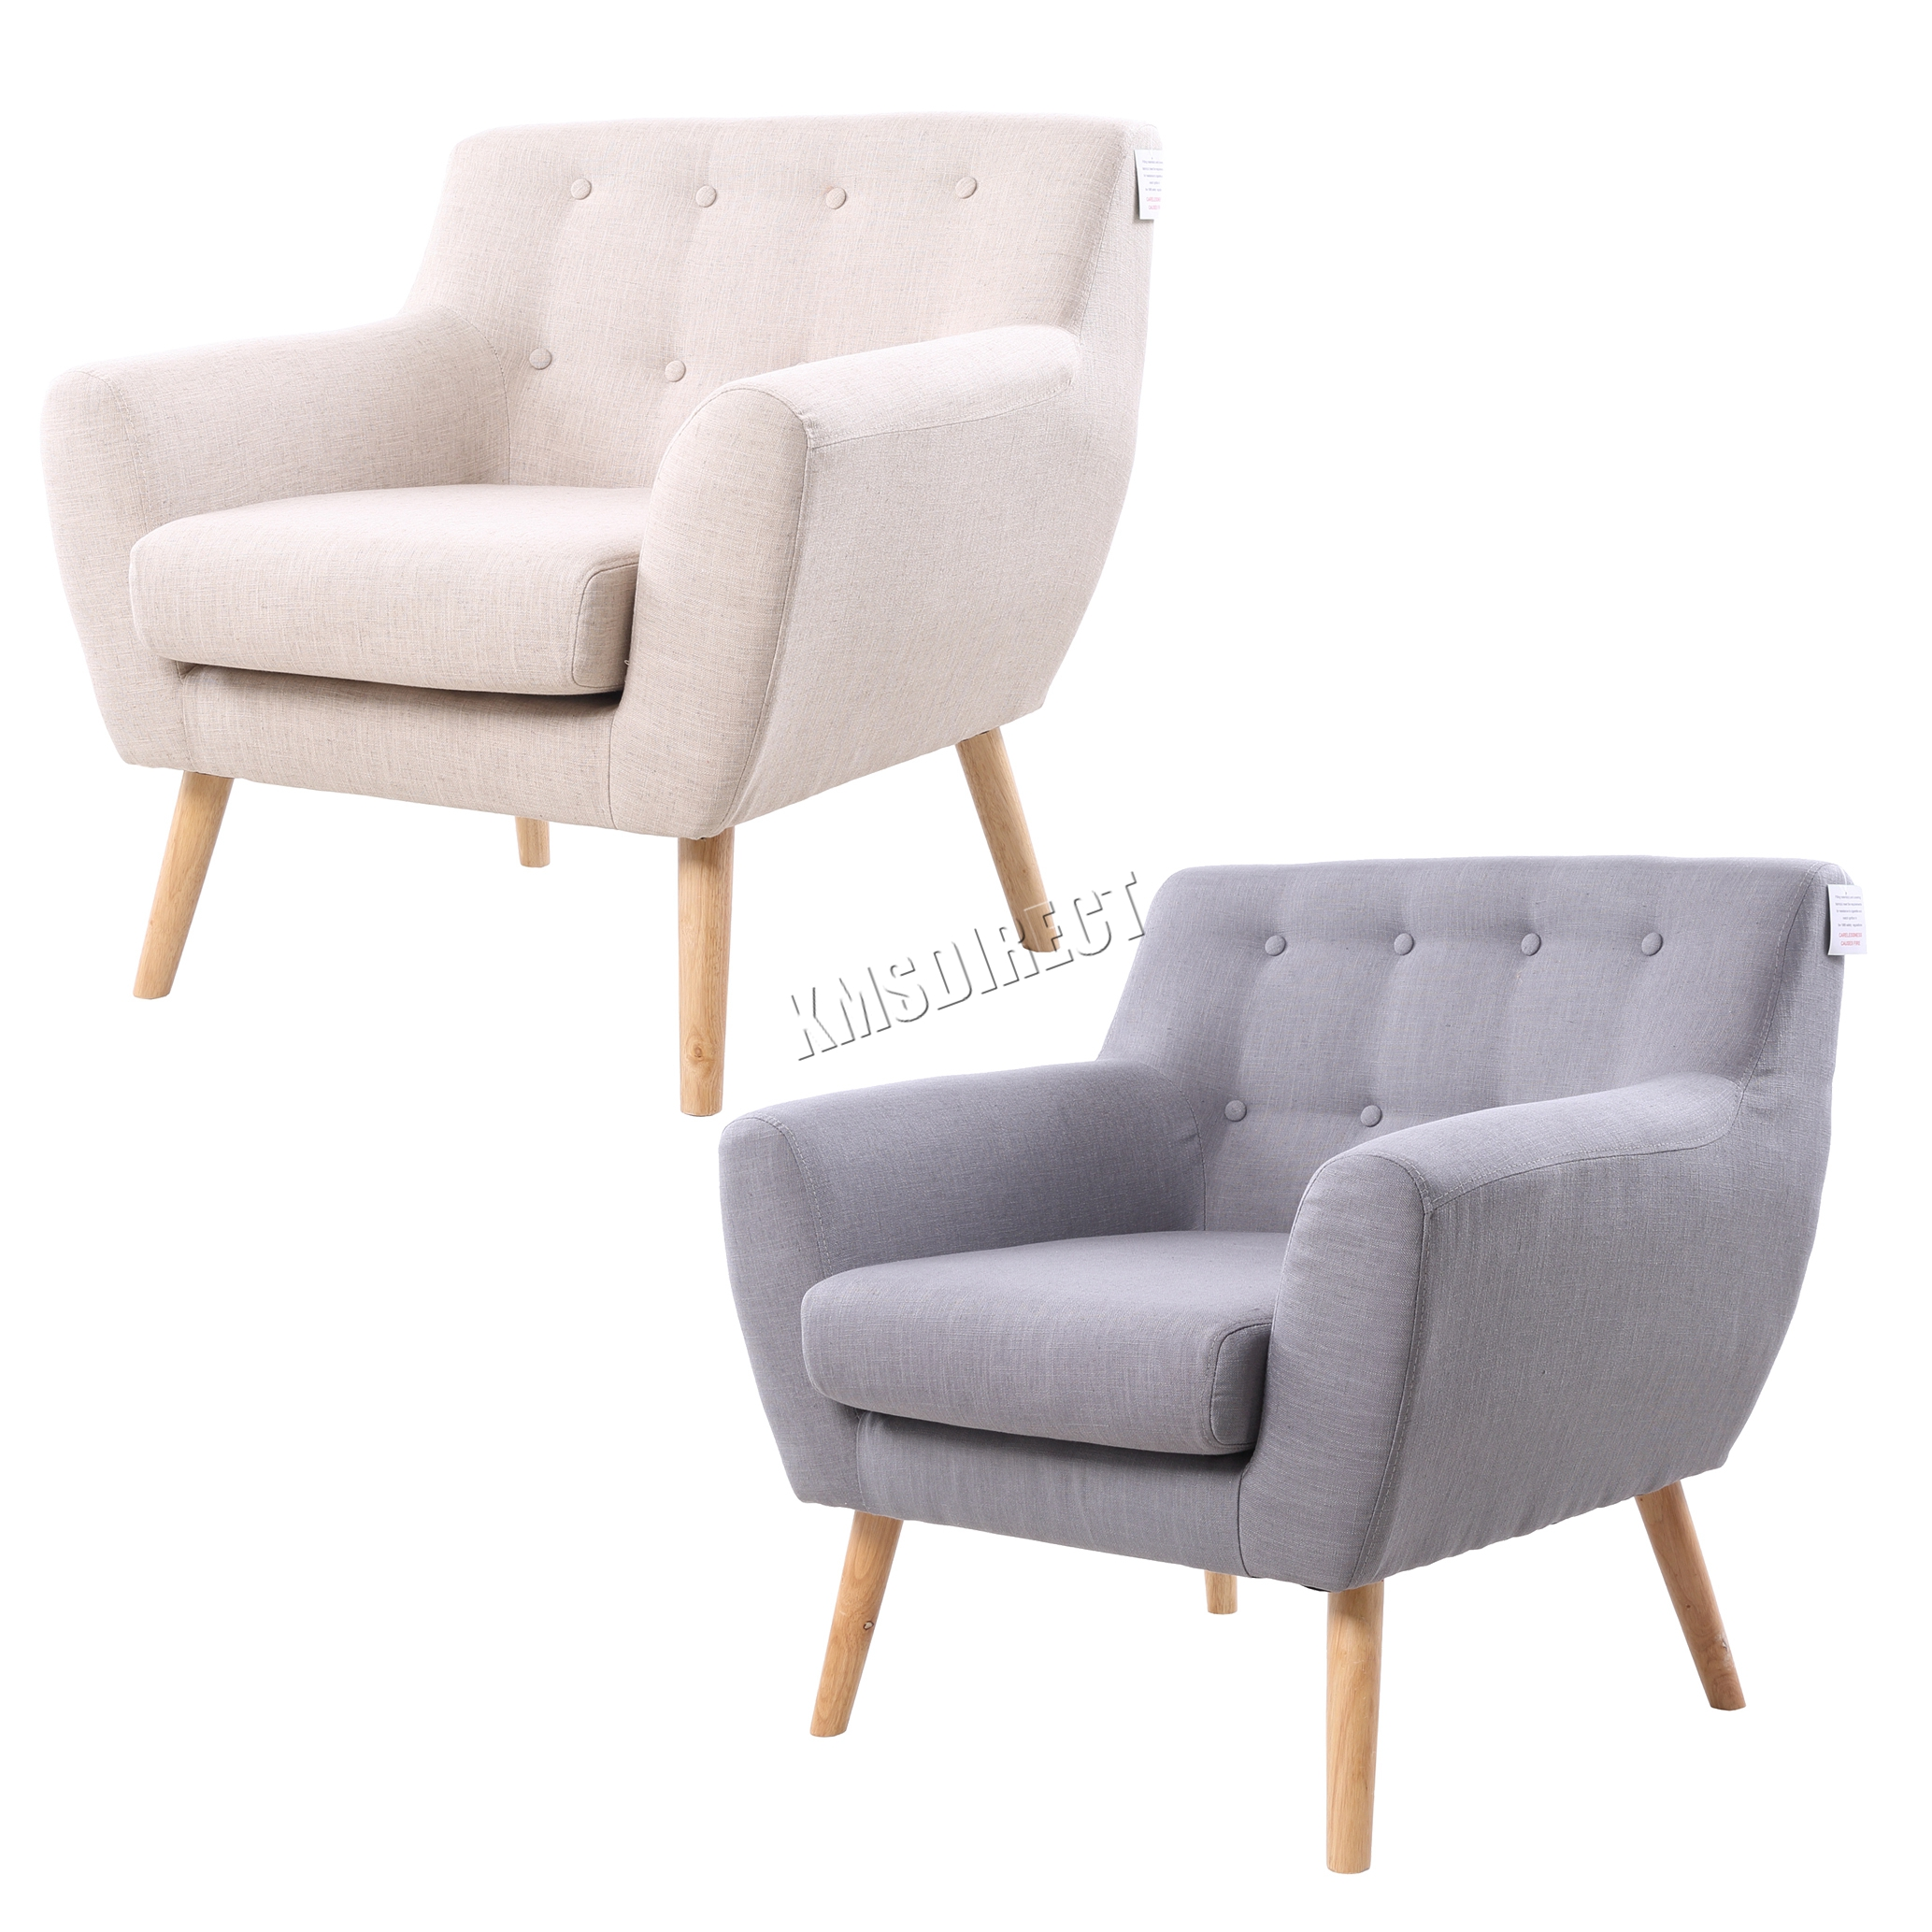 Tub Sofa And Chair Refil Sofa